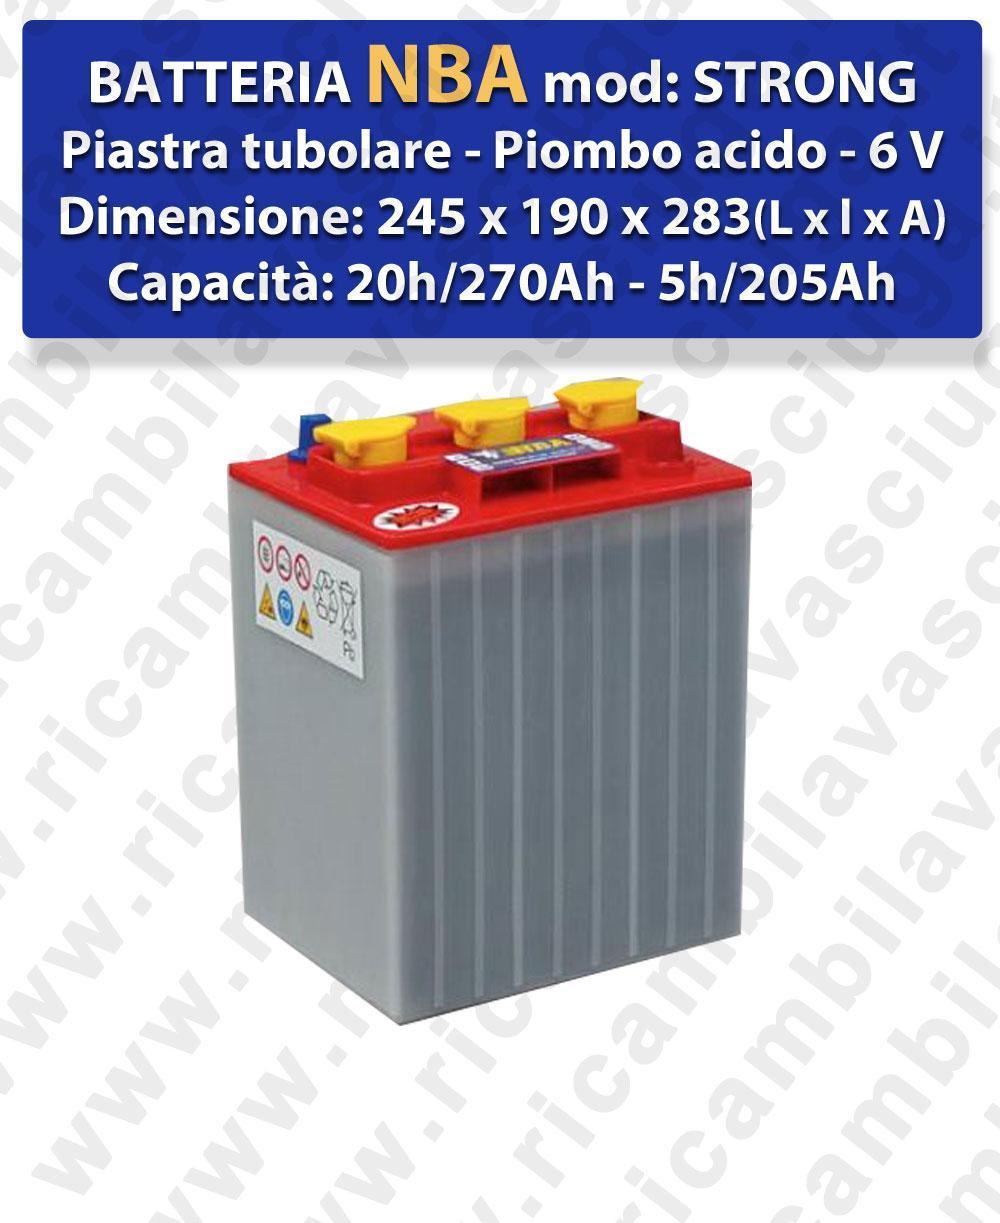 STRONG Batteria piombo - NBA 6V 270Ah 20/h